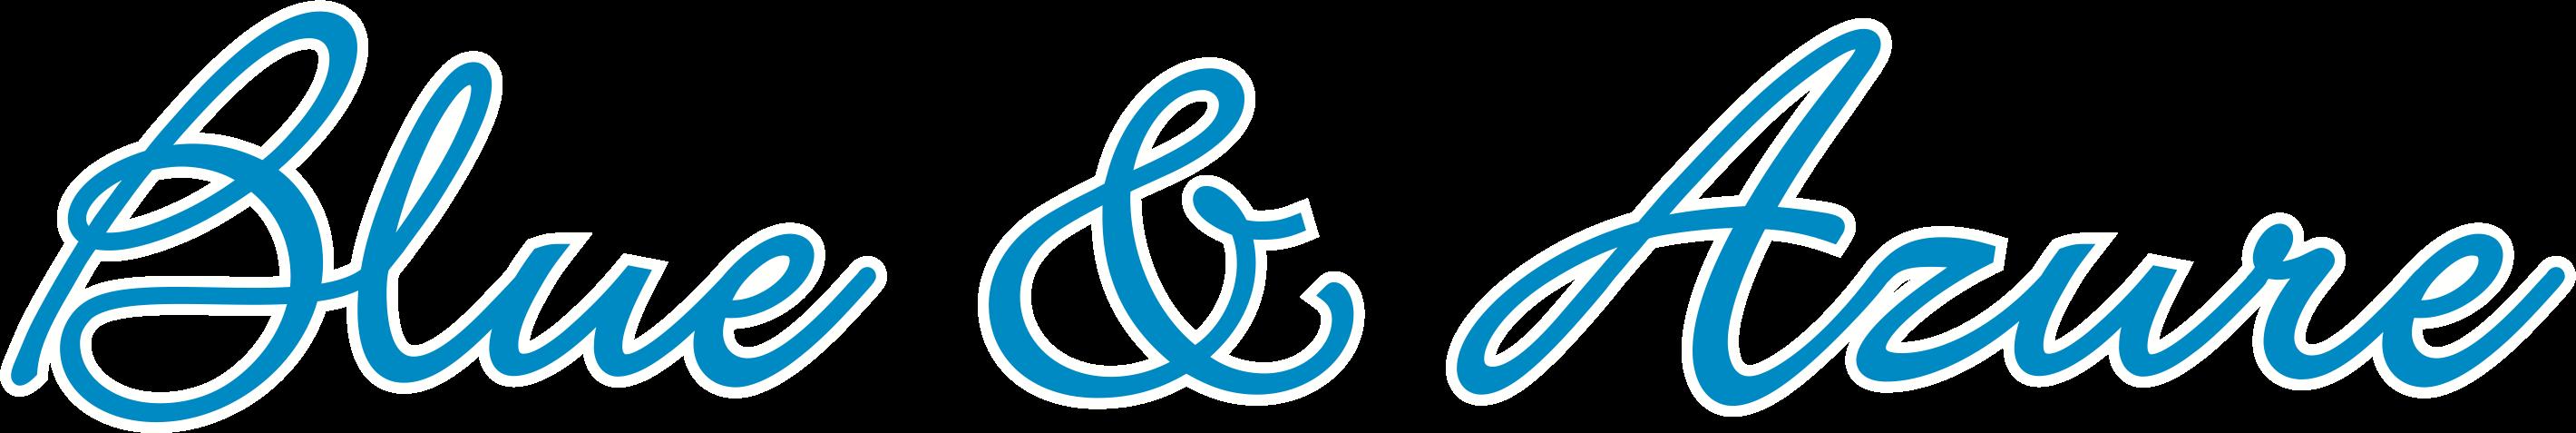 Robolean Białystok logo